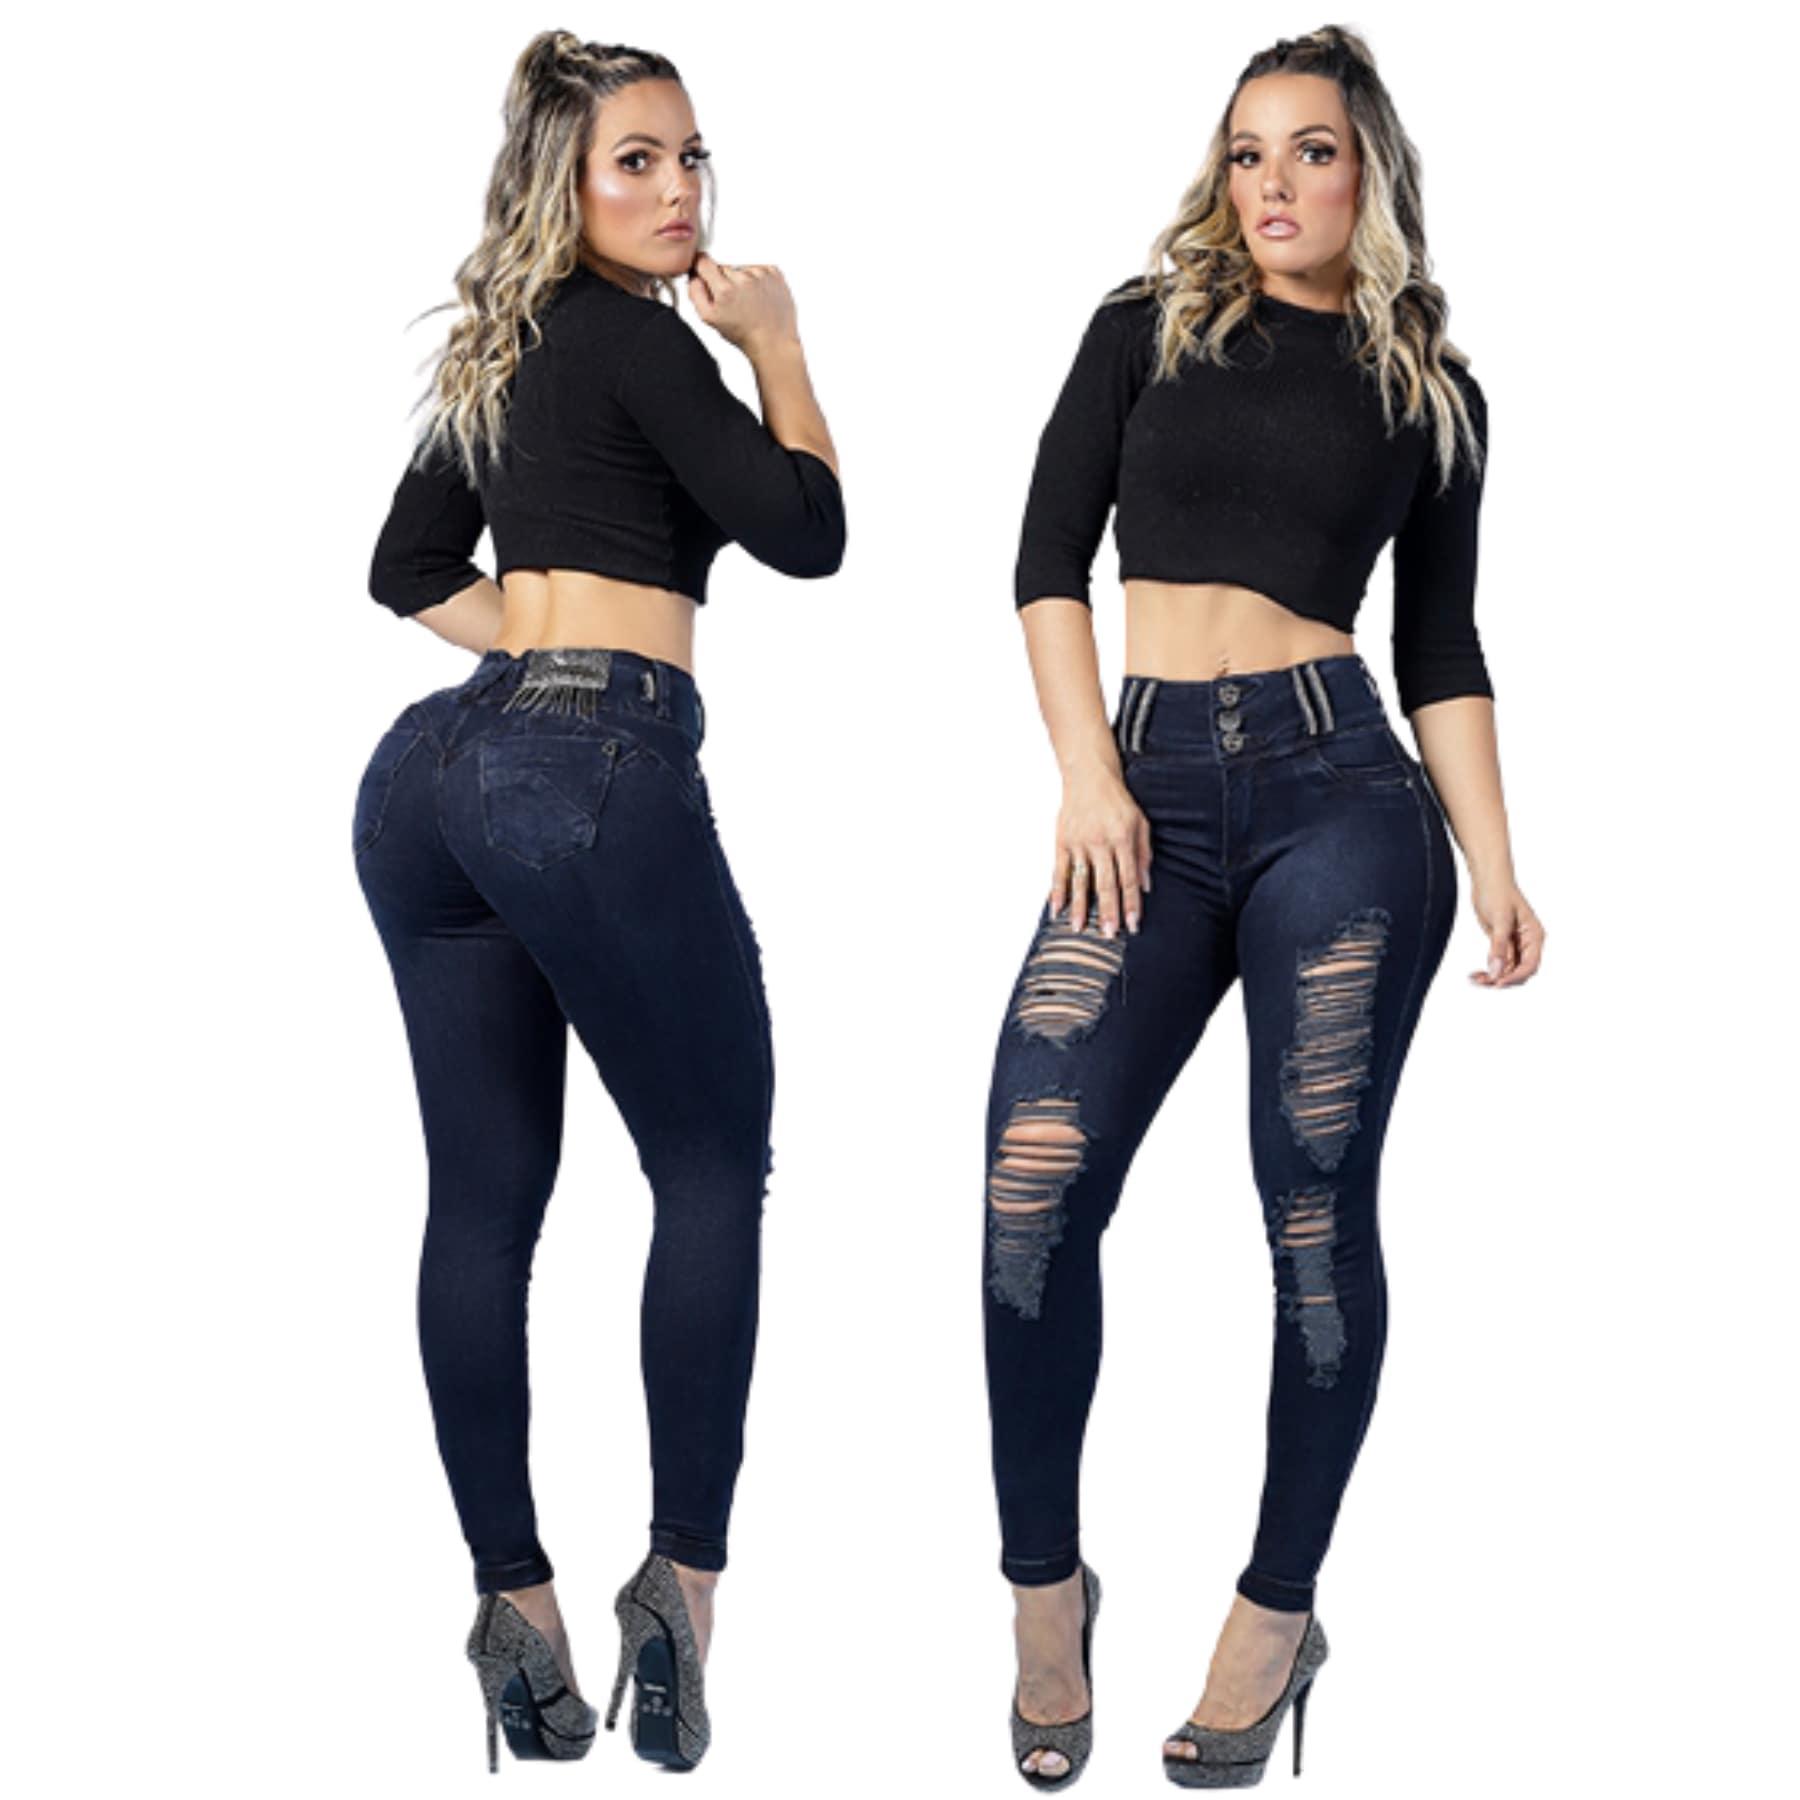 Calça Jeans Cintura Perfeita Modeladora Rhero Jeans